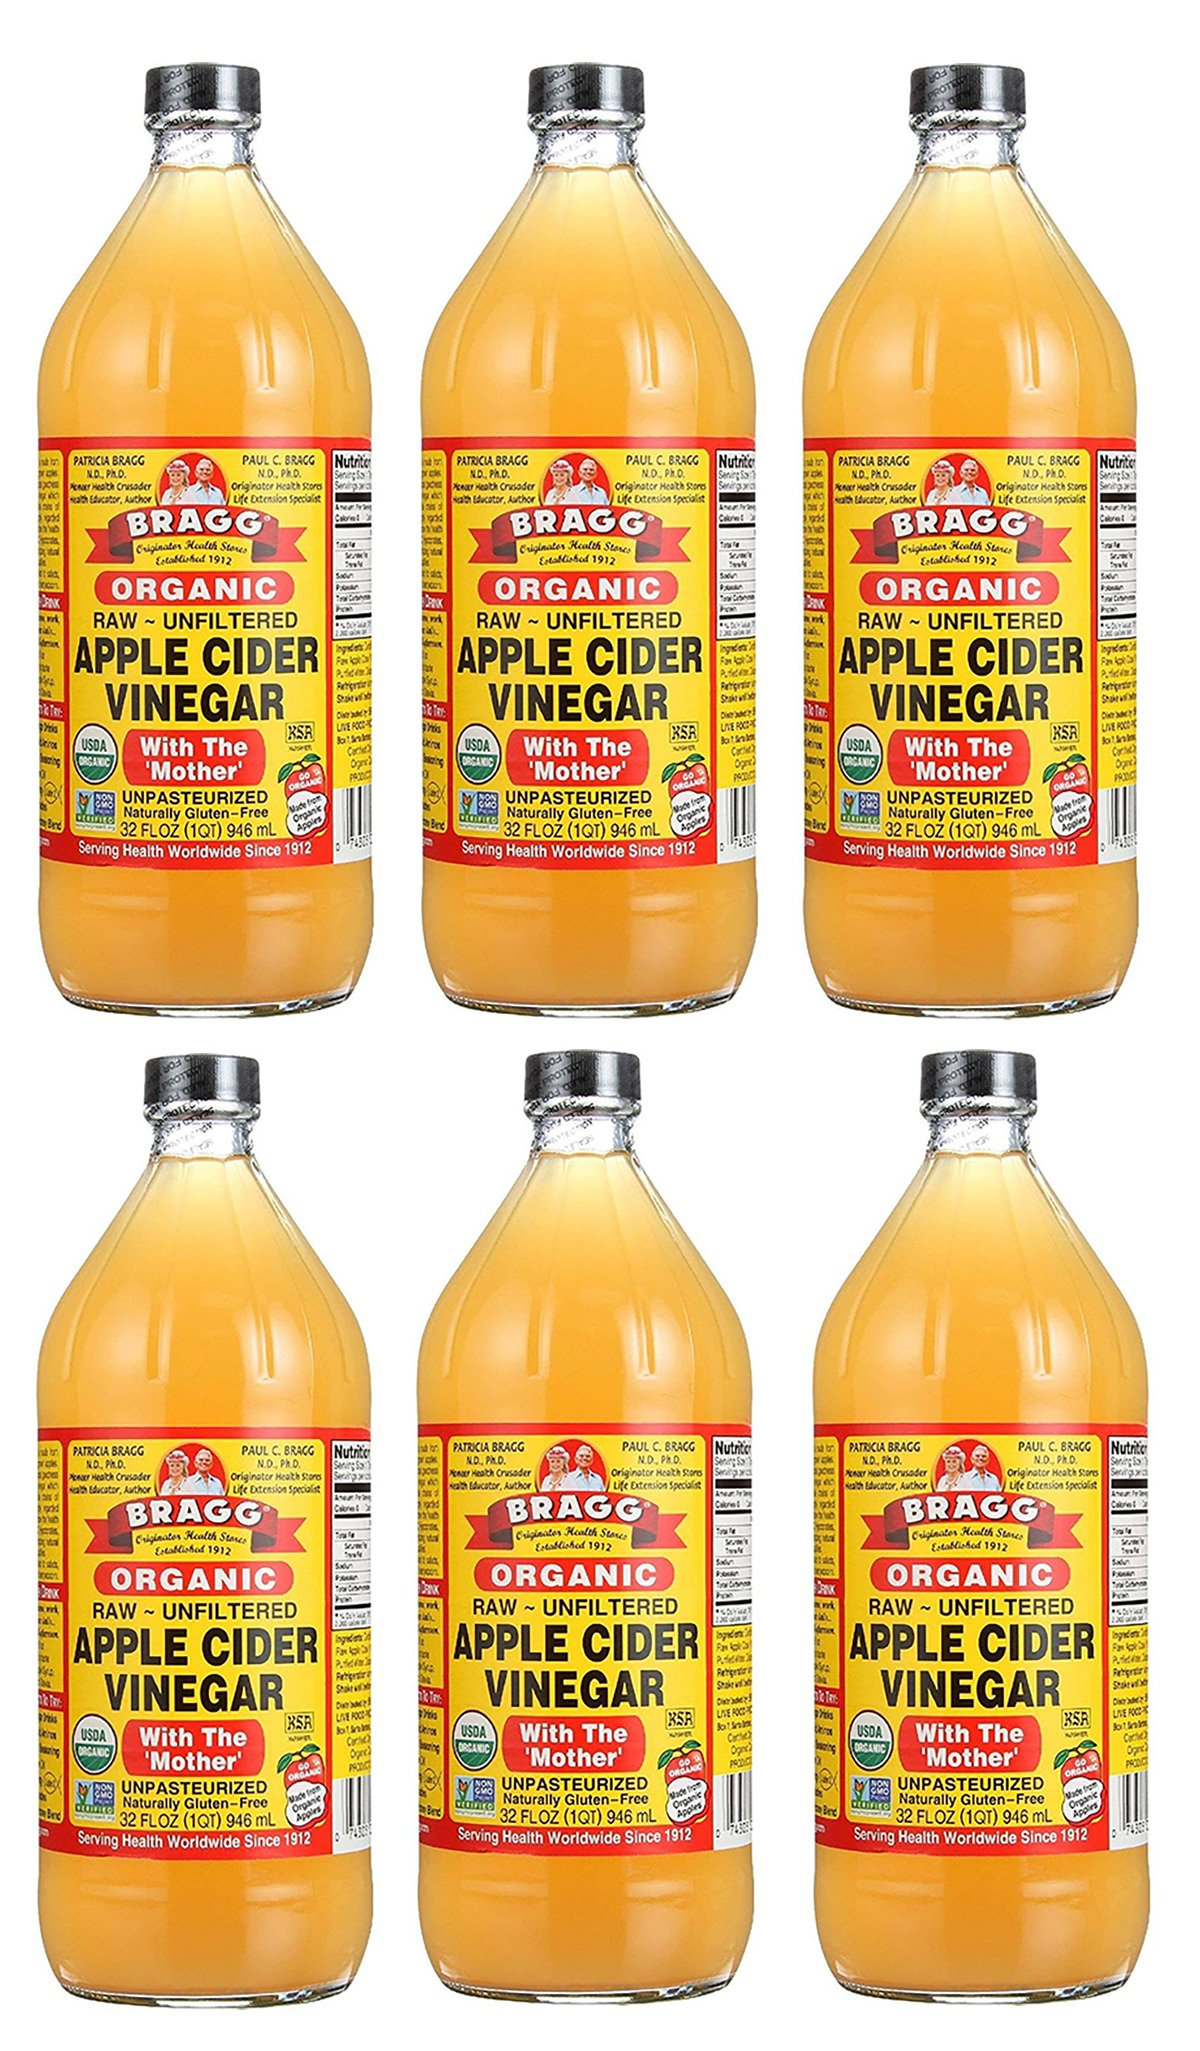 Bragg Usda Organic Raw Apple Cider Vinegar,32 OZ, 6 Pack